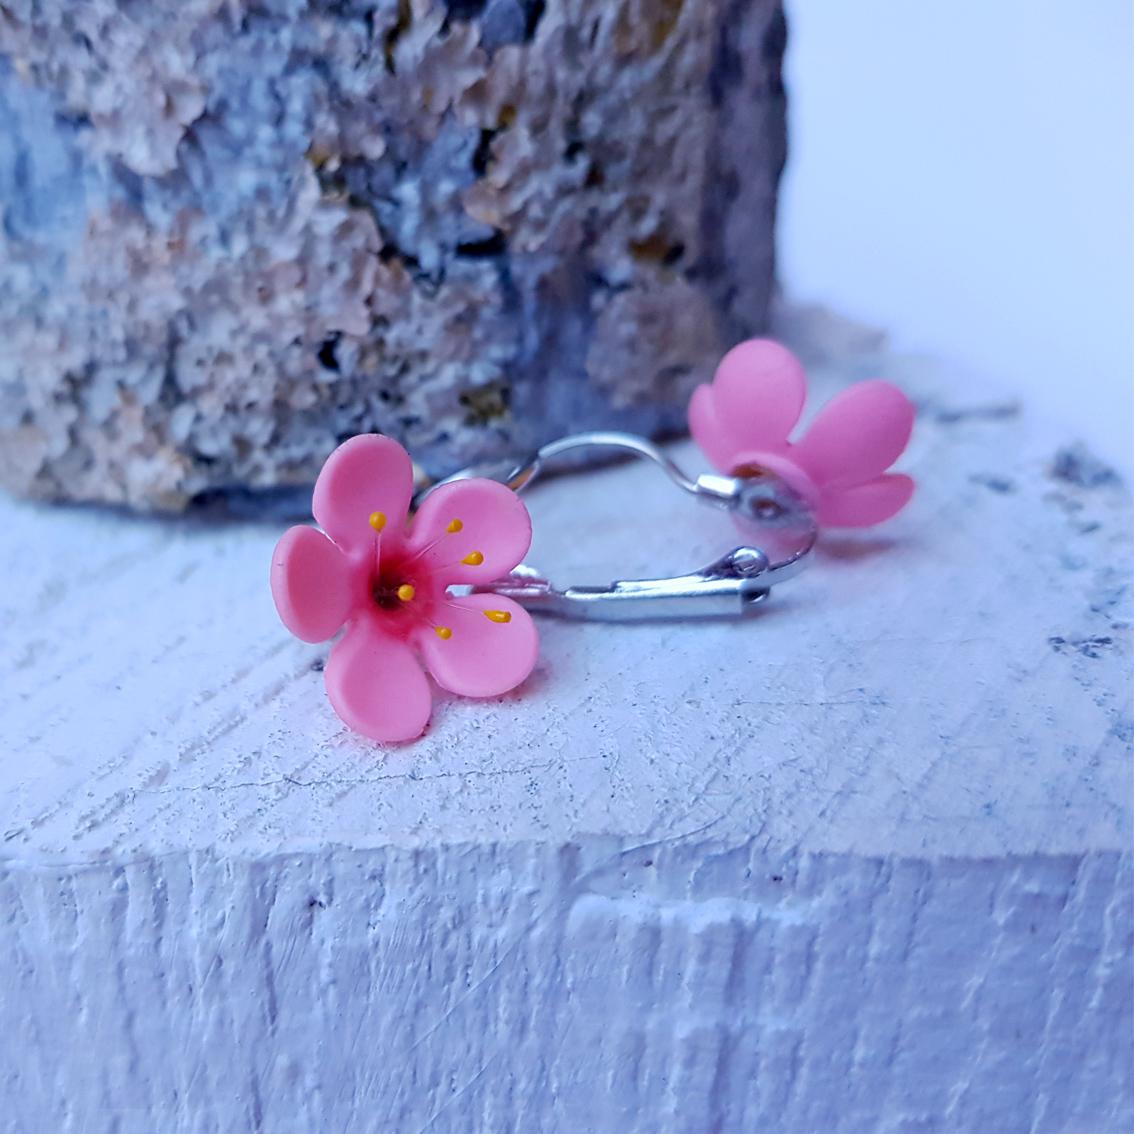 cires roz 2